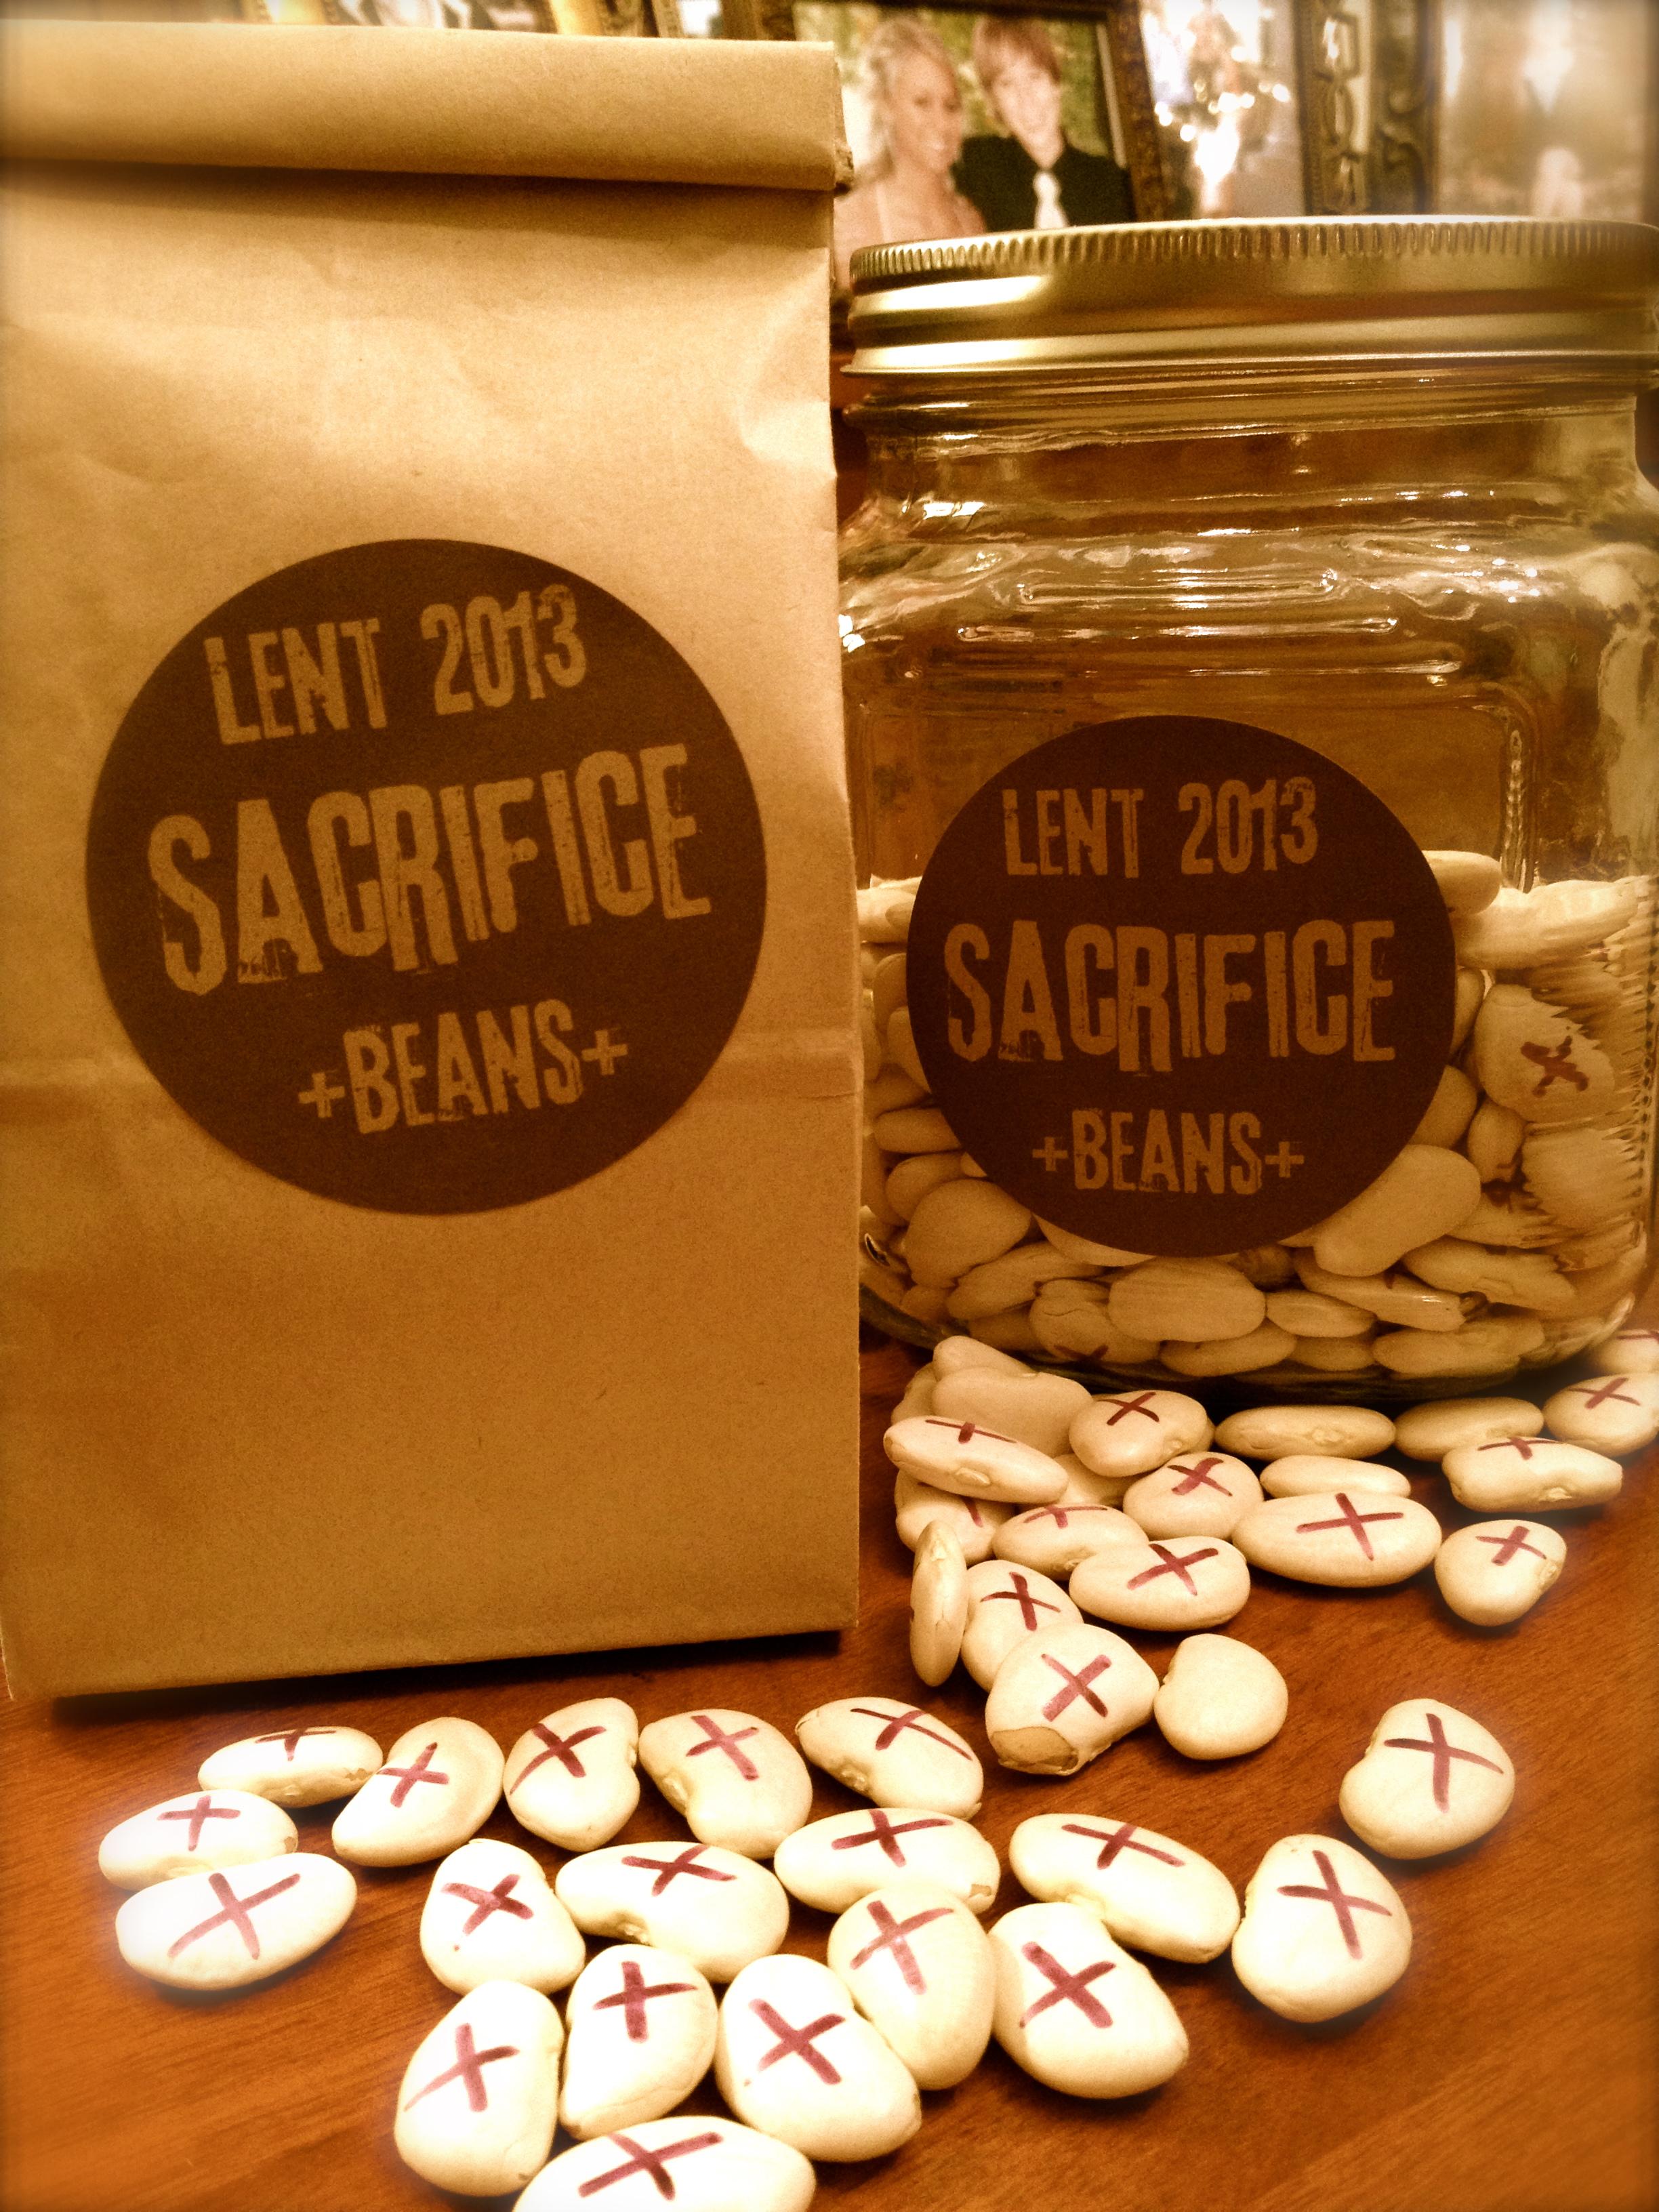 Time To Spill The Beans Lenten Sacrifice Beans For Kids